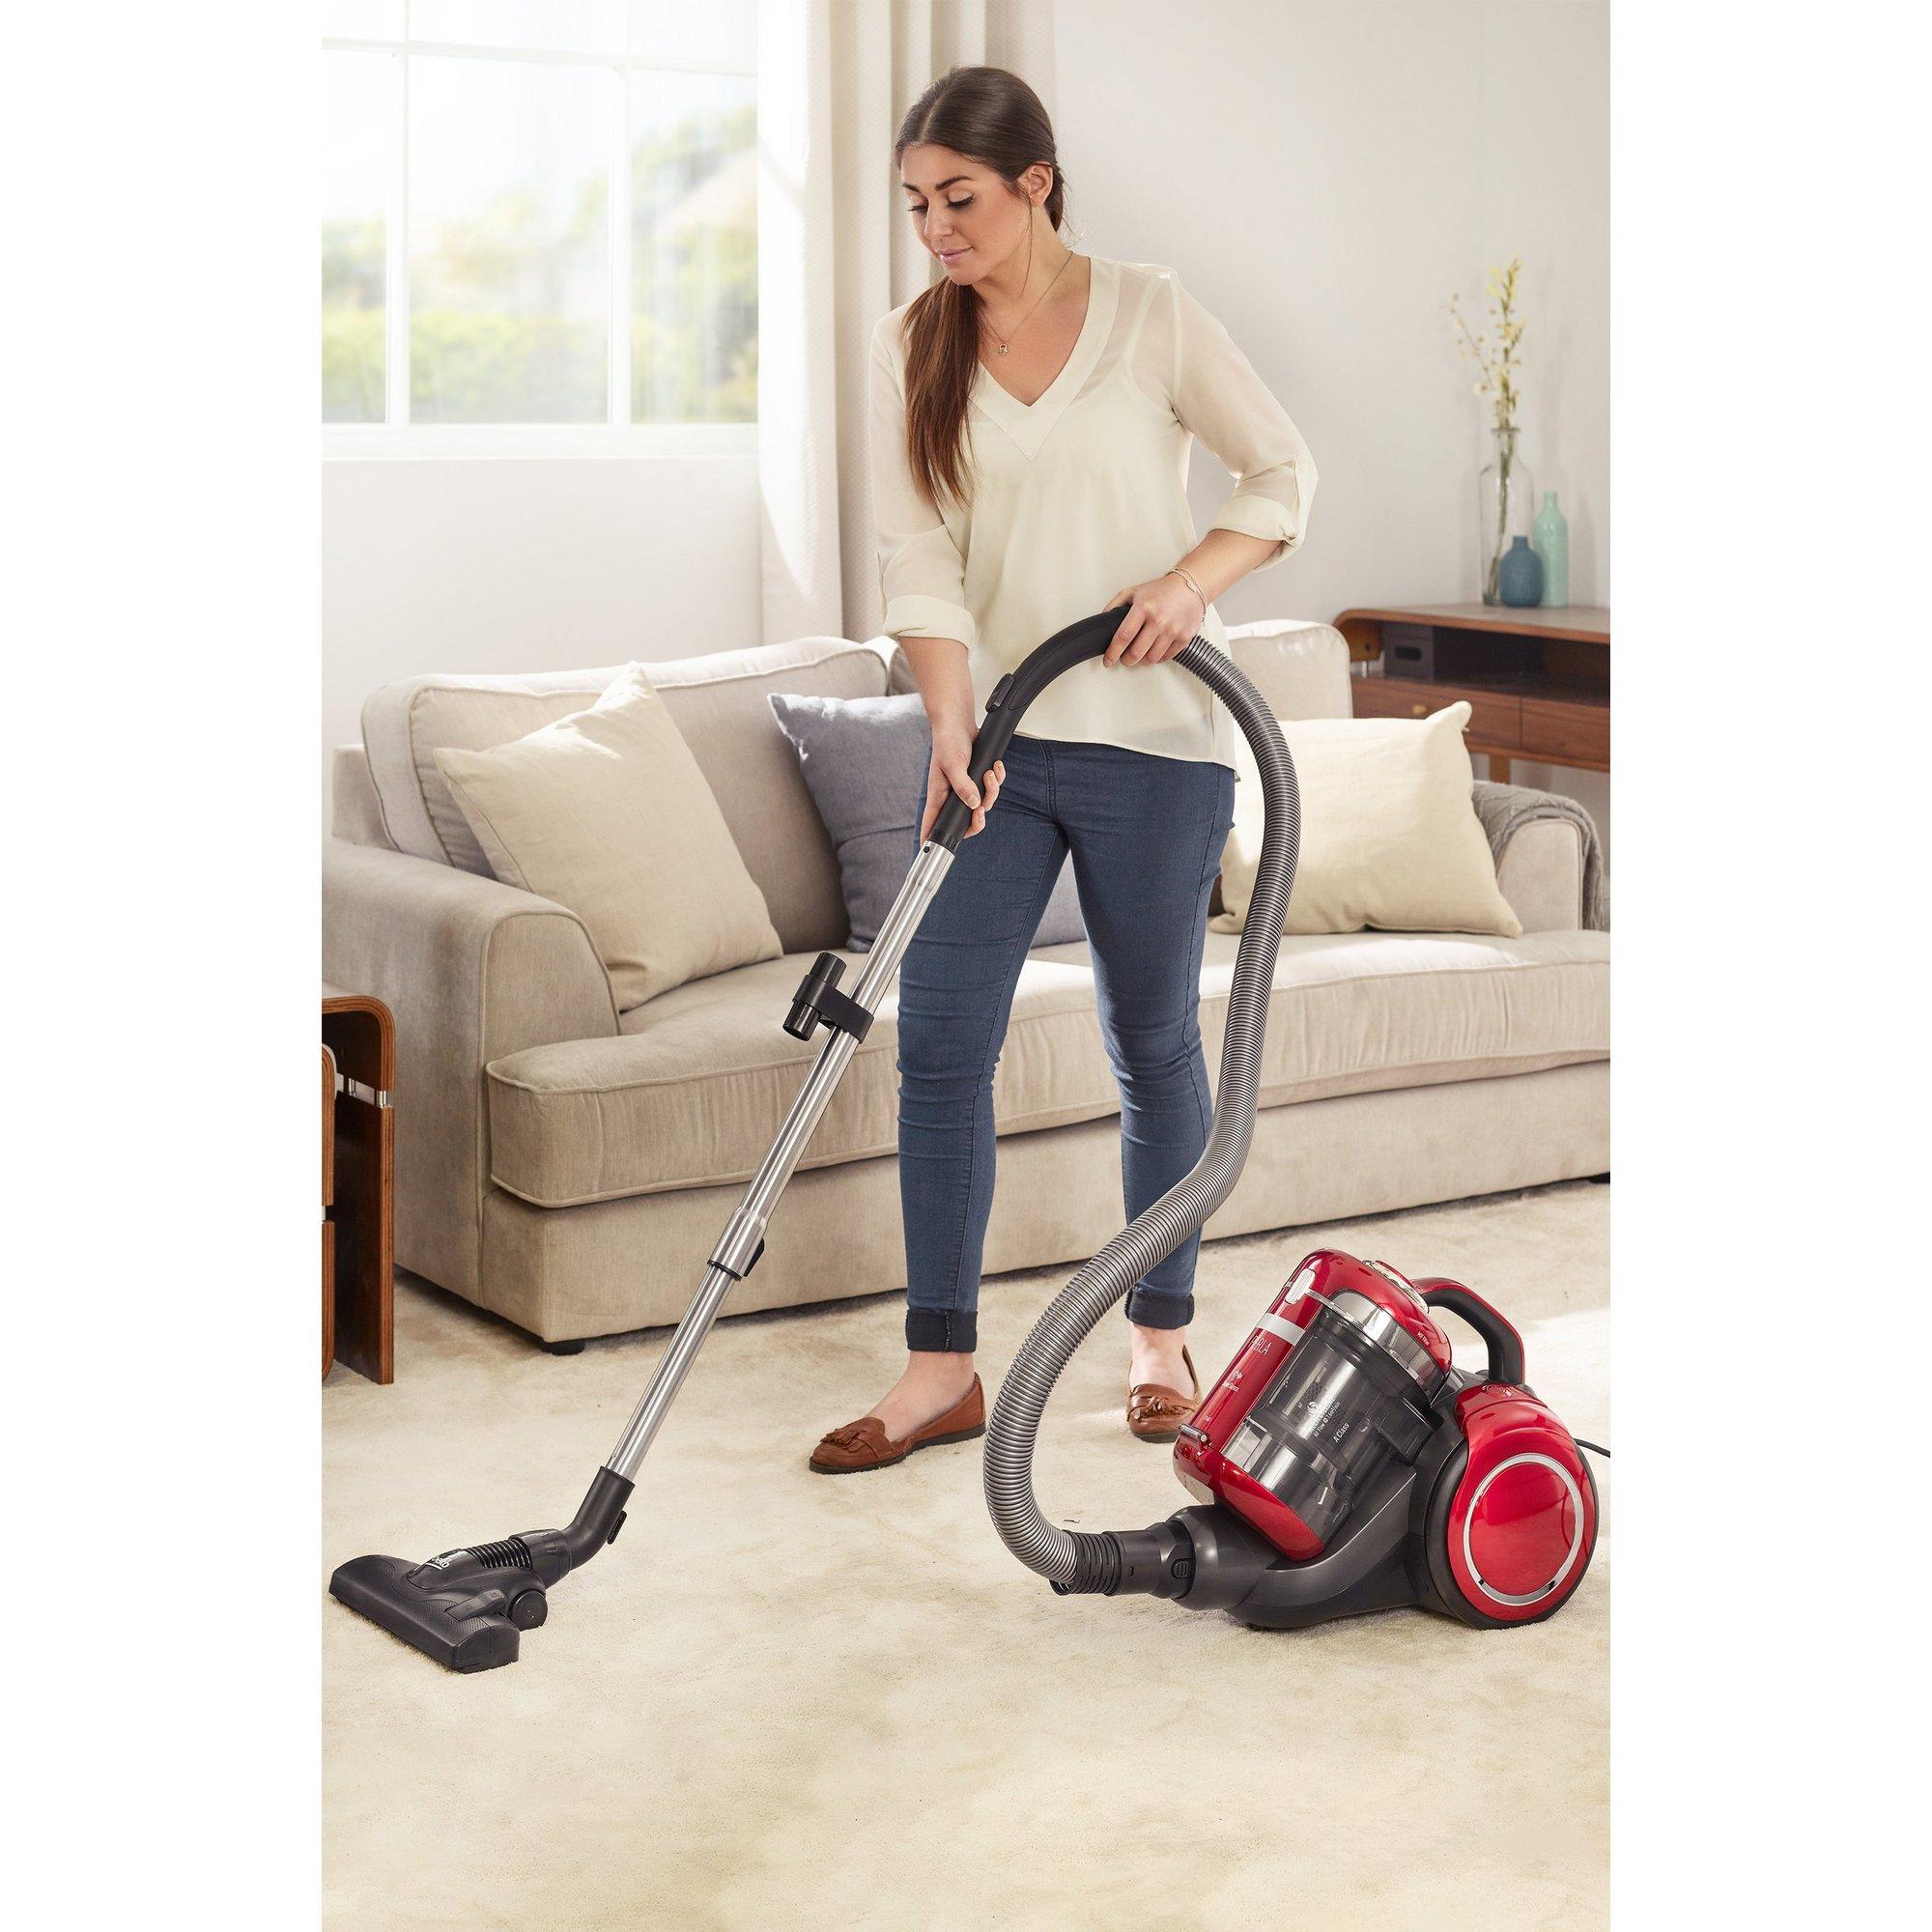 Image of Beko Deluxe Cylinder Vacuum Cleaner